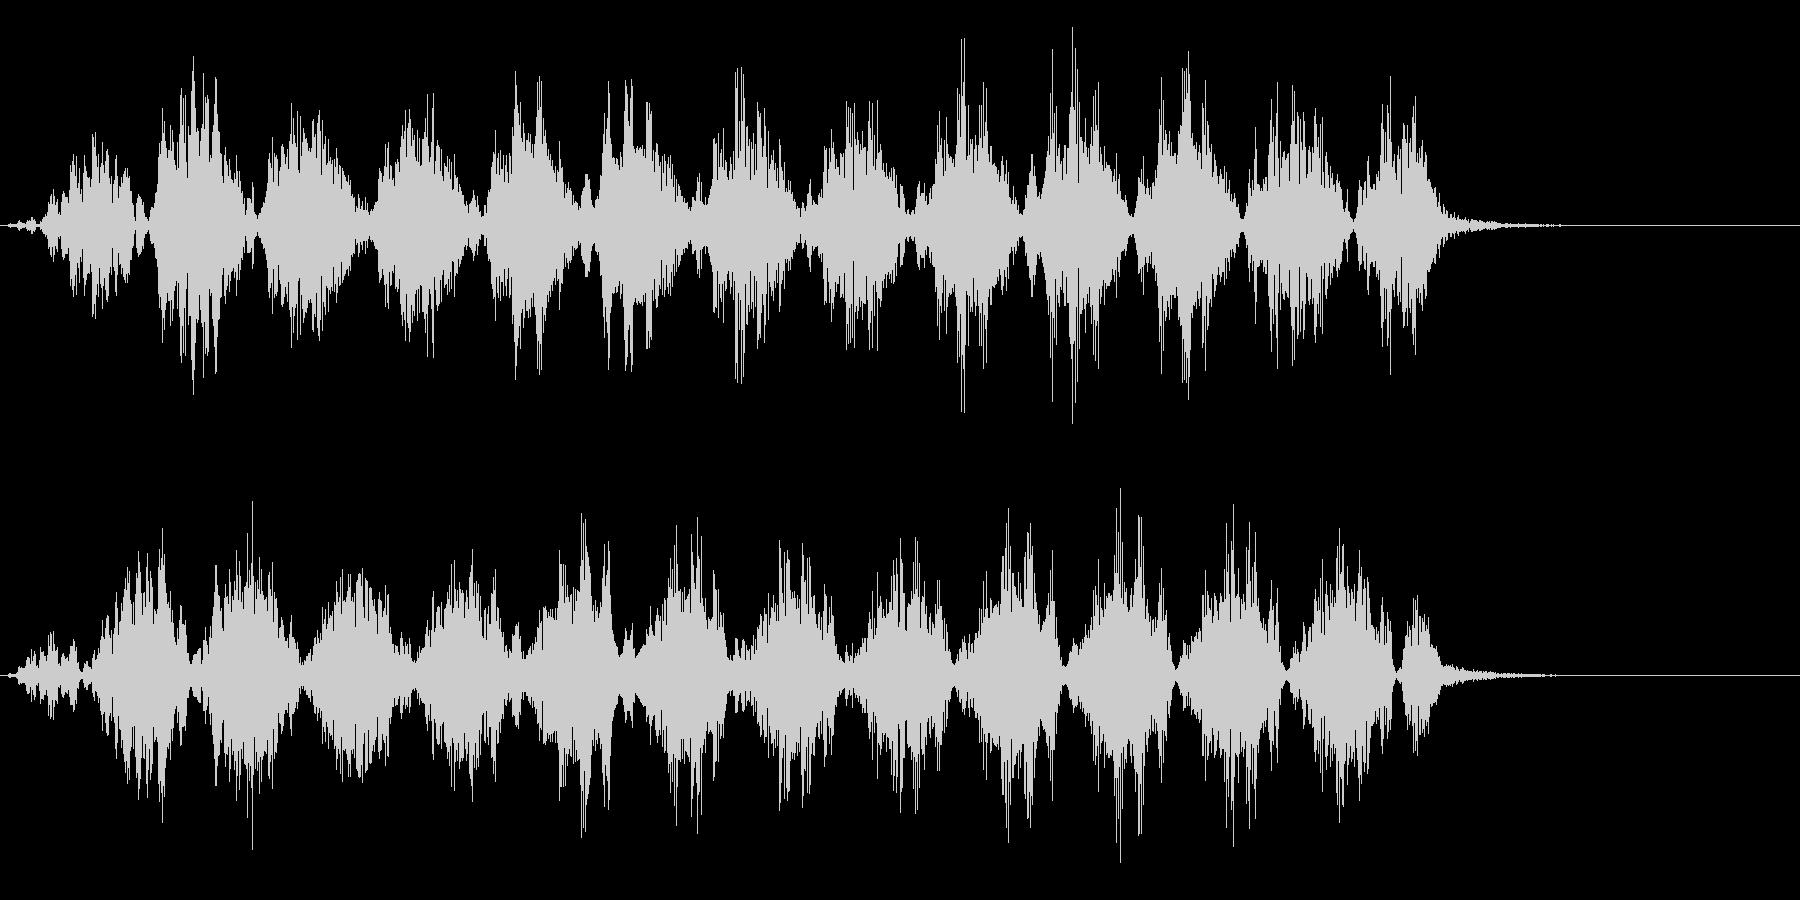 EDM系のDJ/音楽制作用フレーズ!01の未再生の波形